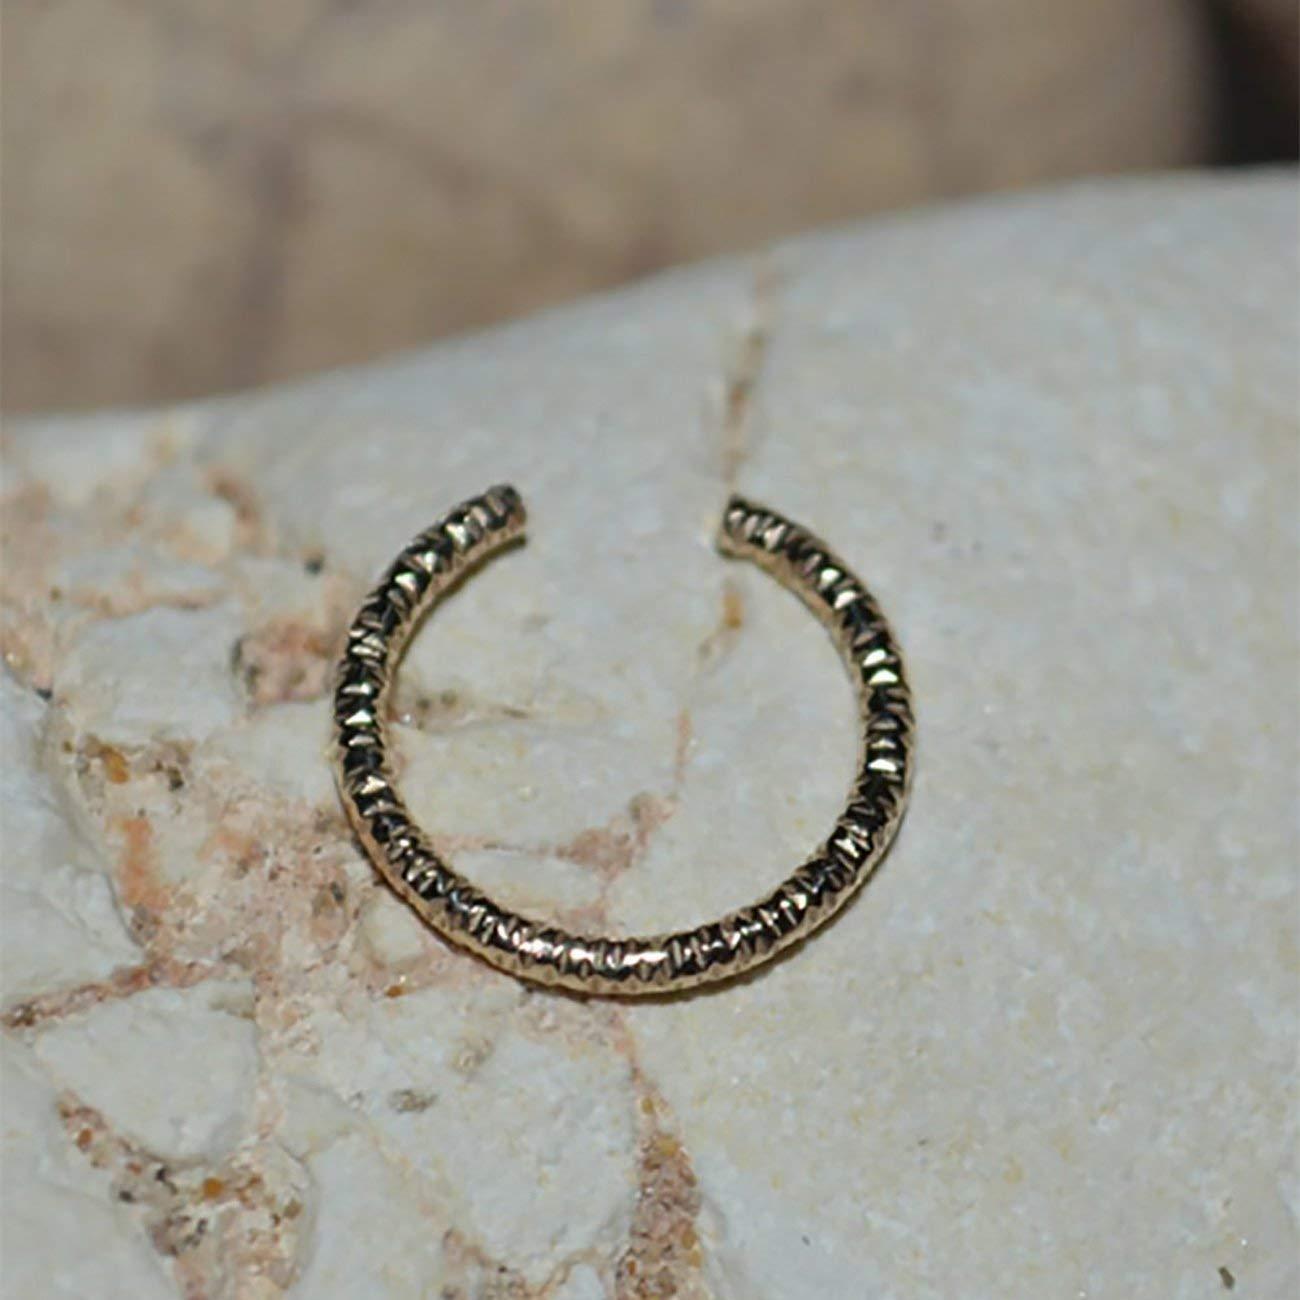 FAUX NOSE RING // Fake Nose Ring - Gold Fake Helix Piercing - Non Pierced Ear Cuff - Fake Tragus Piercing - Nose Cuff 18 gauge